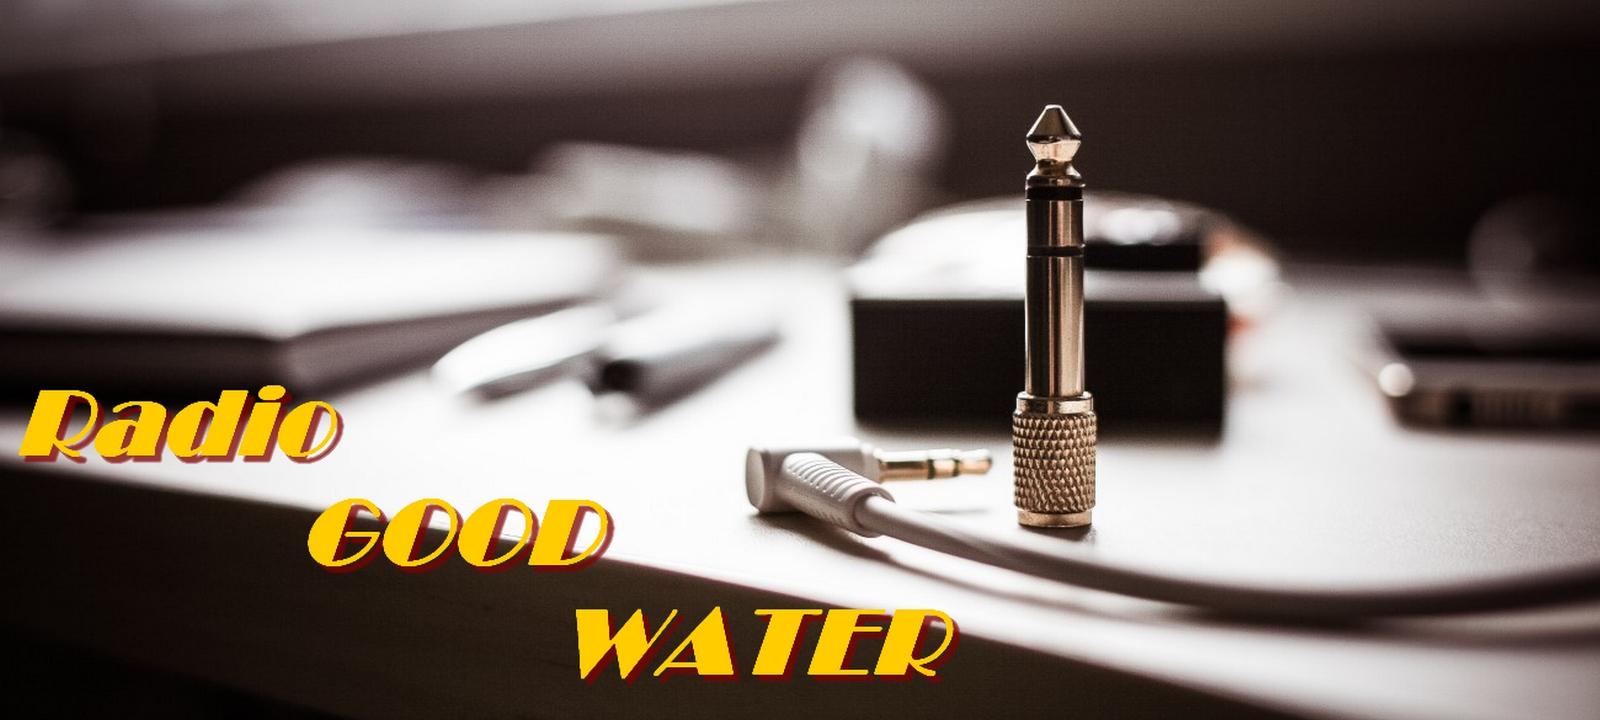 Radio Good Water live